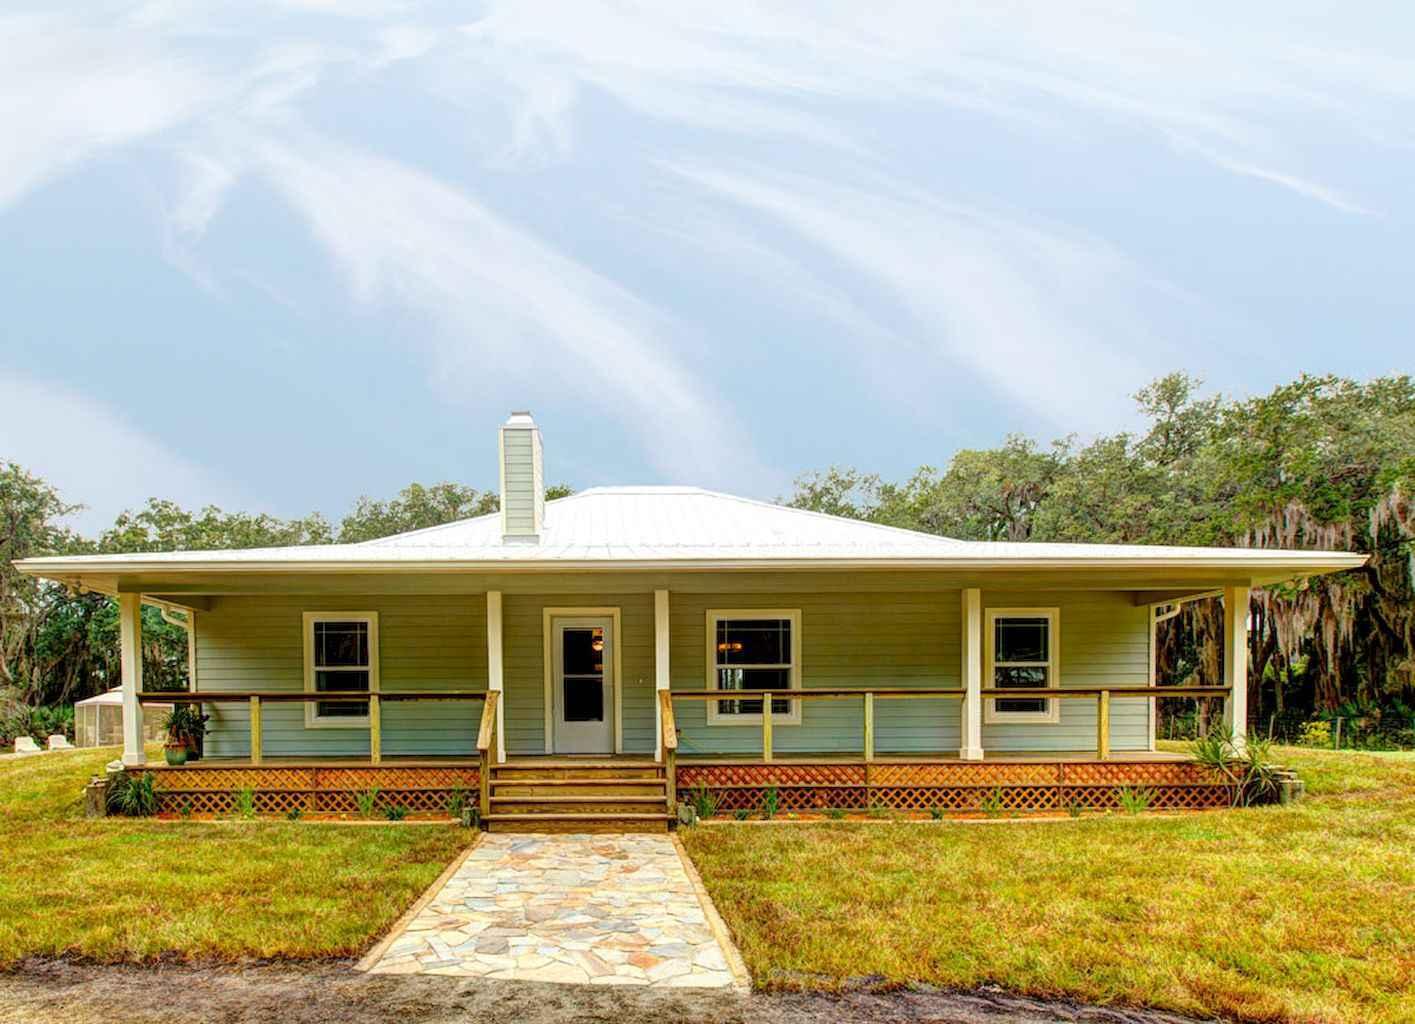 60 amazing farmhouse plans cracker style design ideas (31)